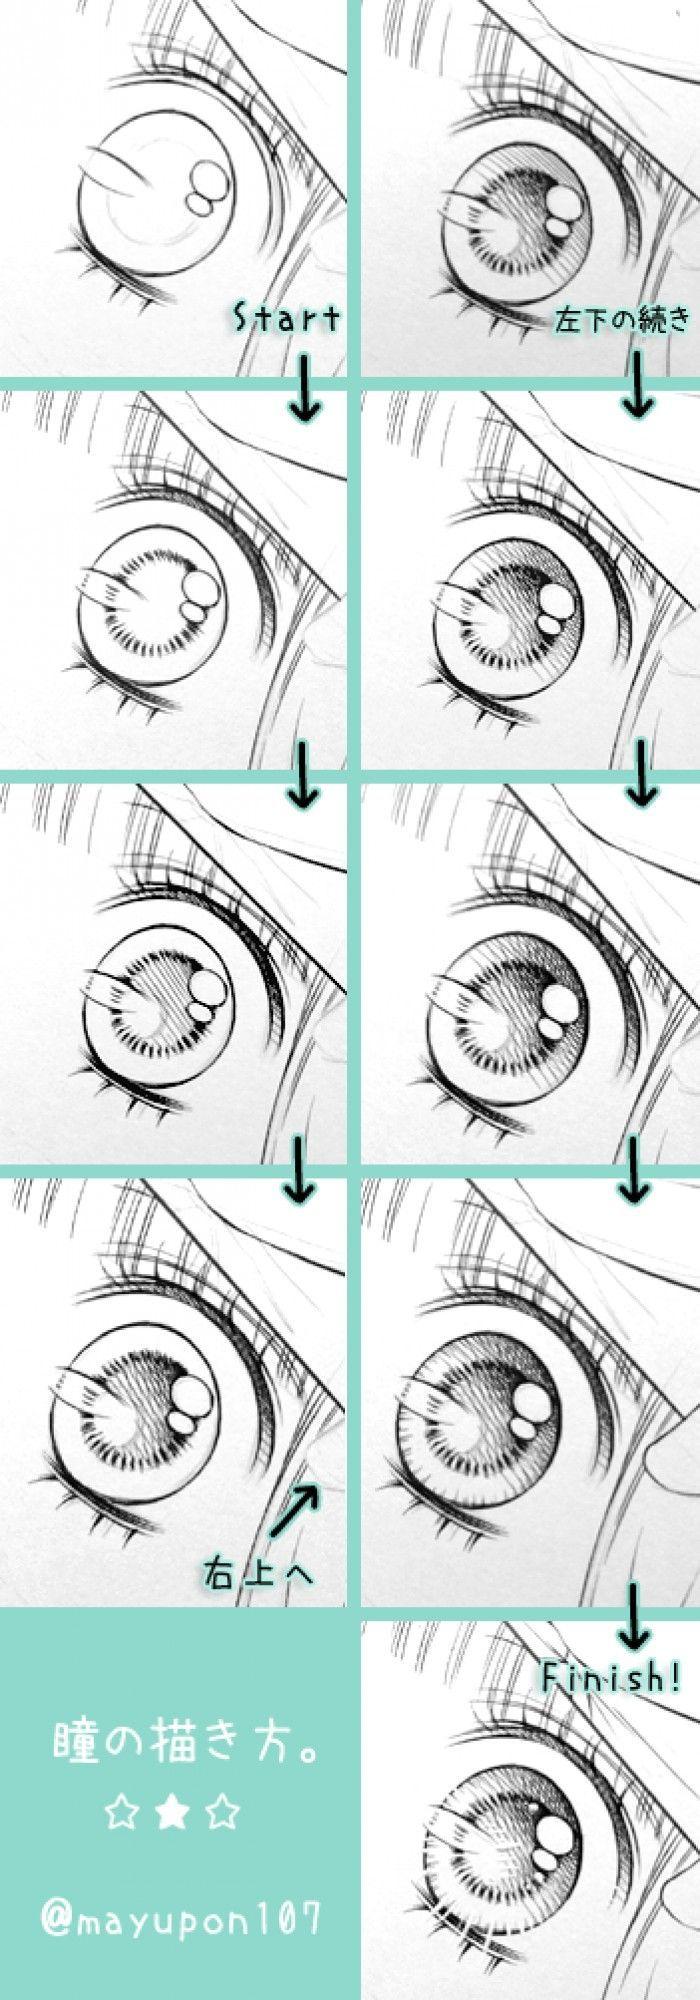 technique de mangaka comment dessiner les yeux en manga. Black Bedroom Furniture Sets. Home Design Ideas